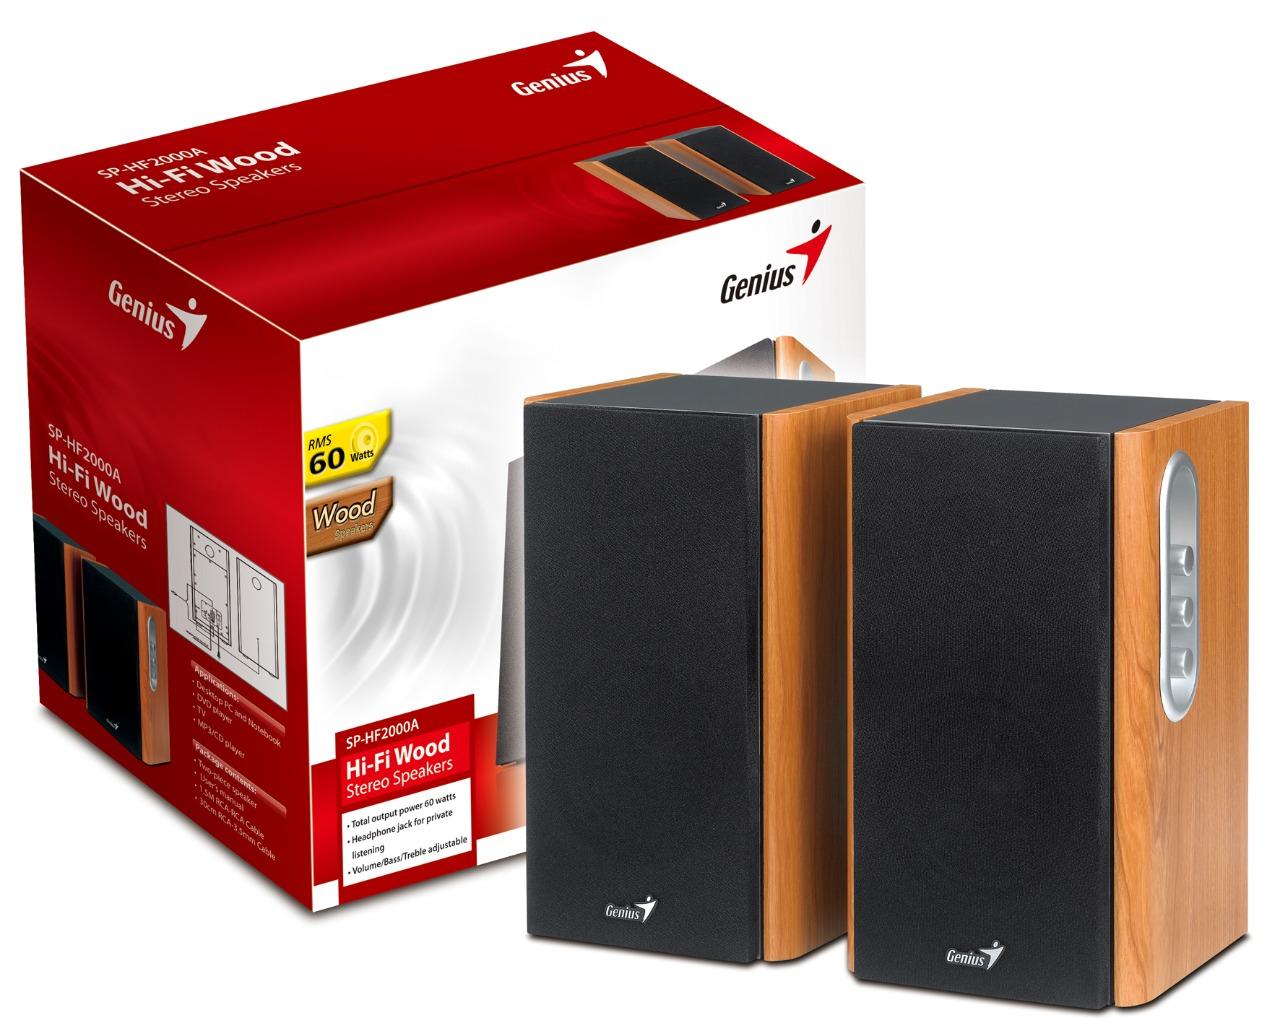 WHOLESALE SPEAKER : SP-HF2000A 230V EU - 60 watt Hi-Fi wood speakers_2